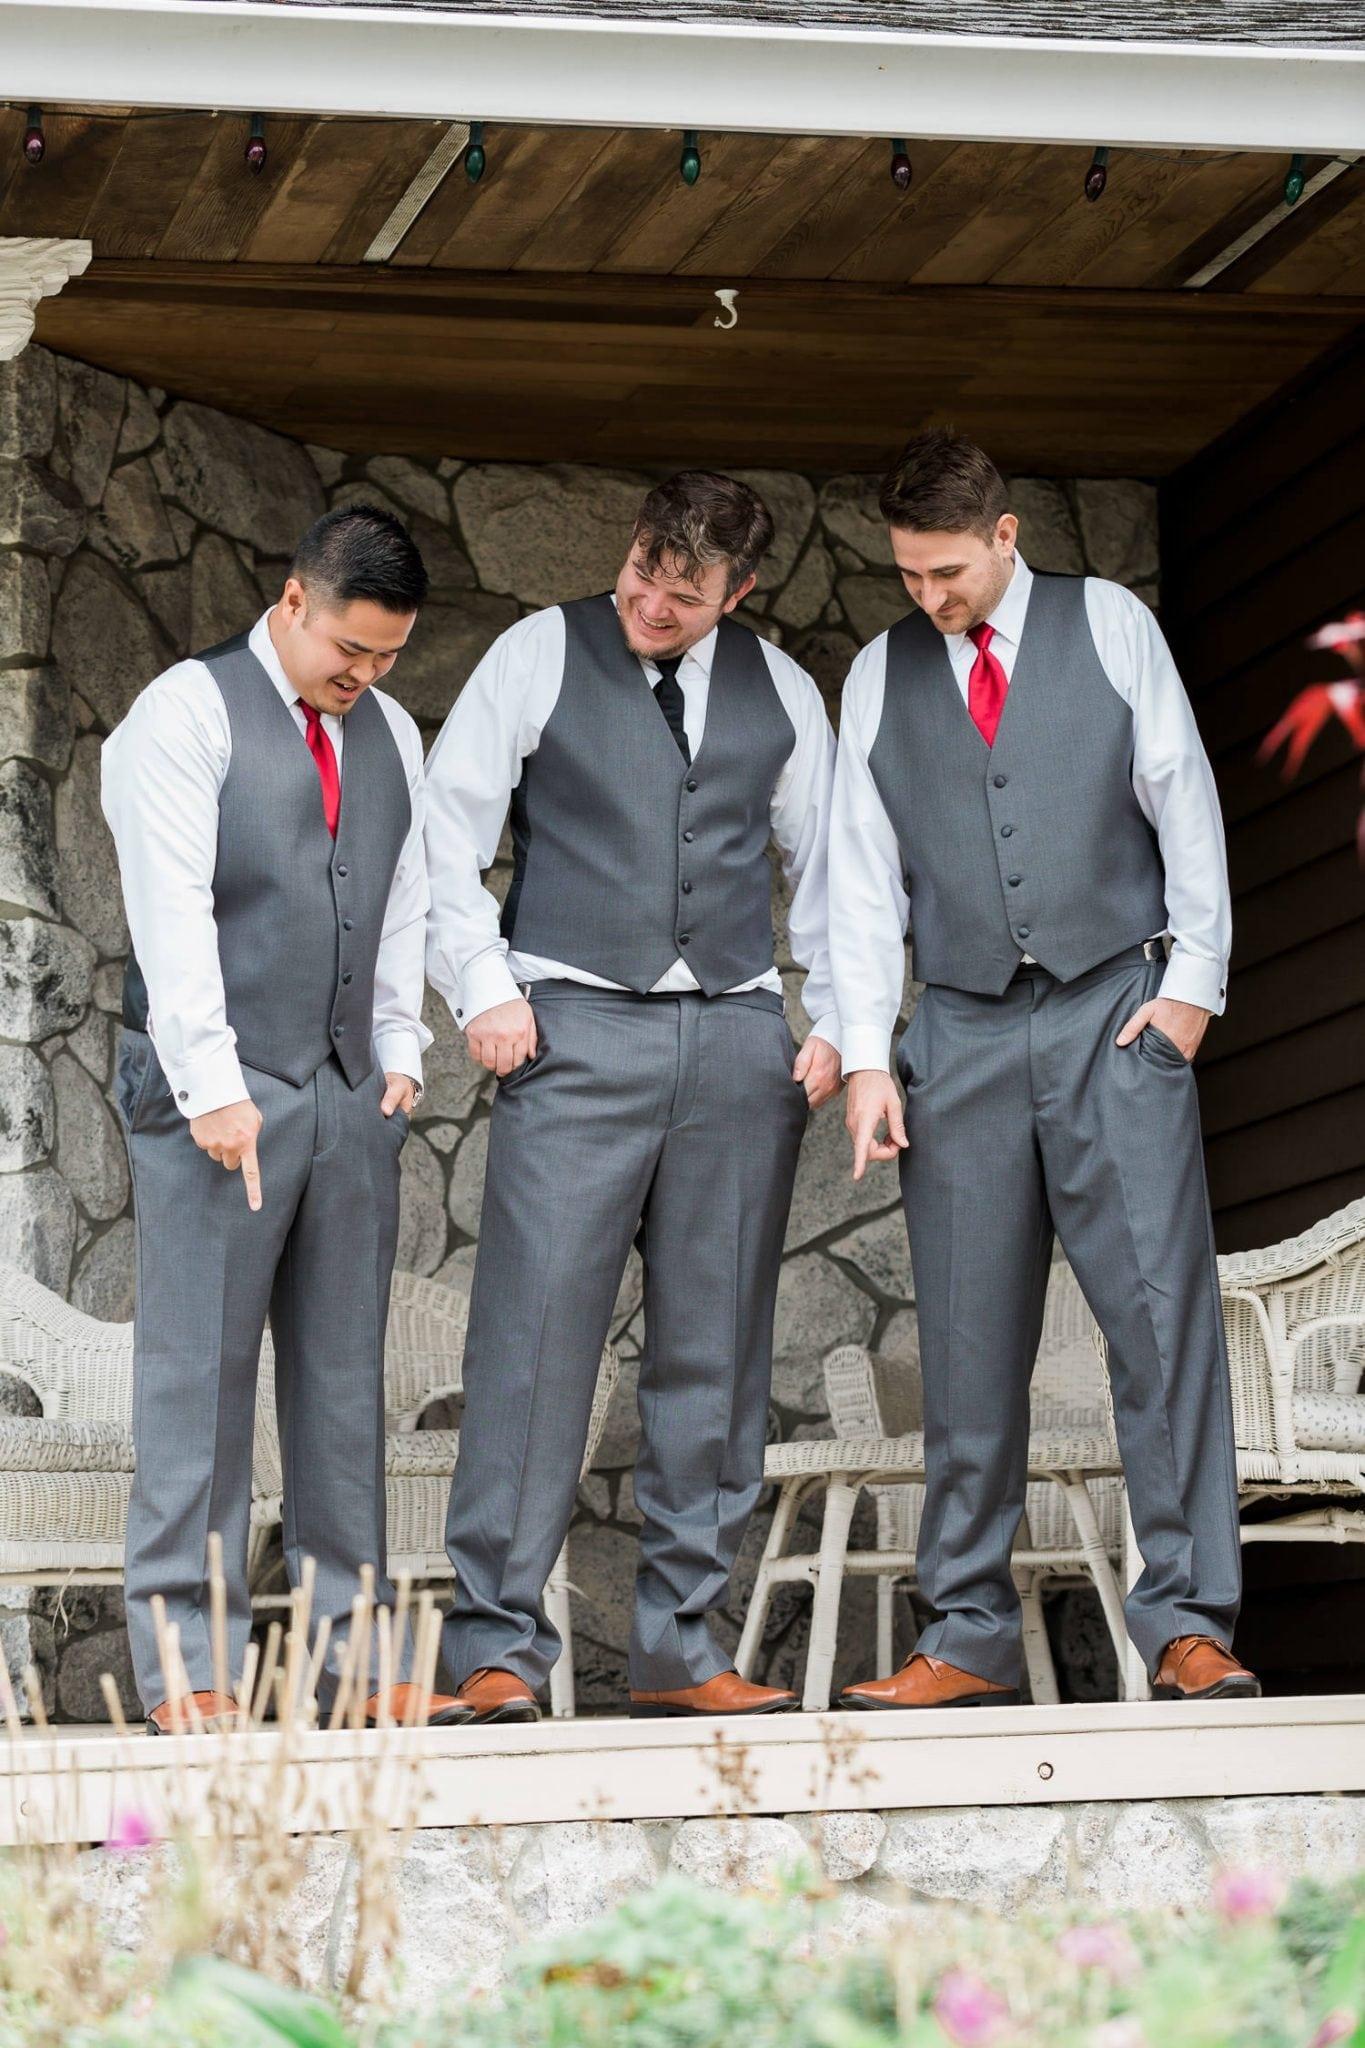 Groom and groomsmen | Vancouver wedding photographer